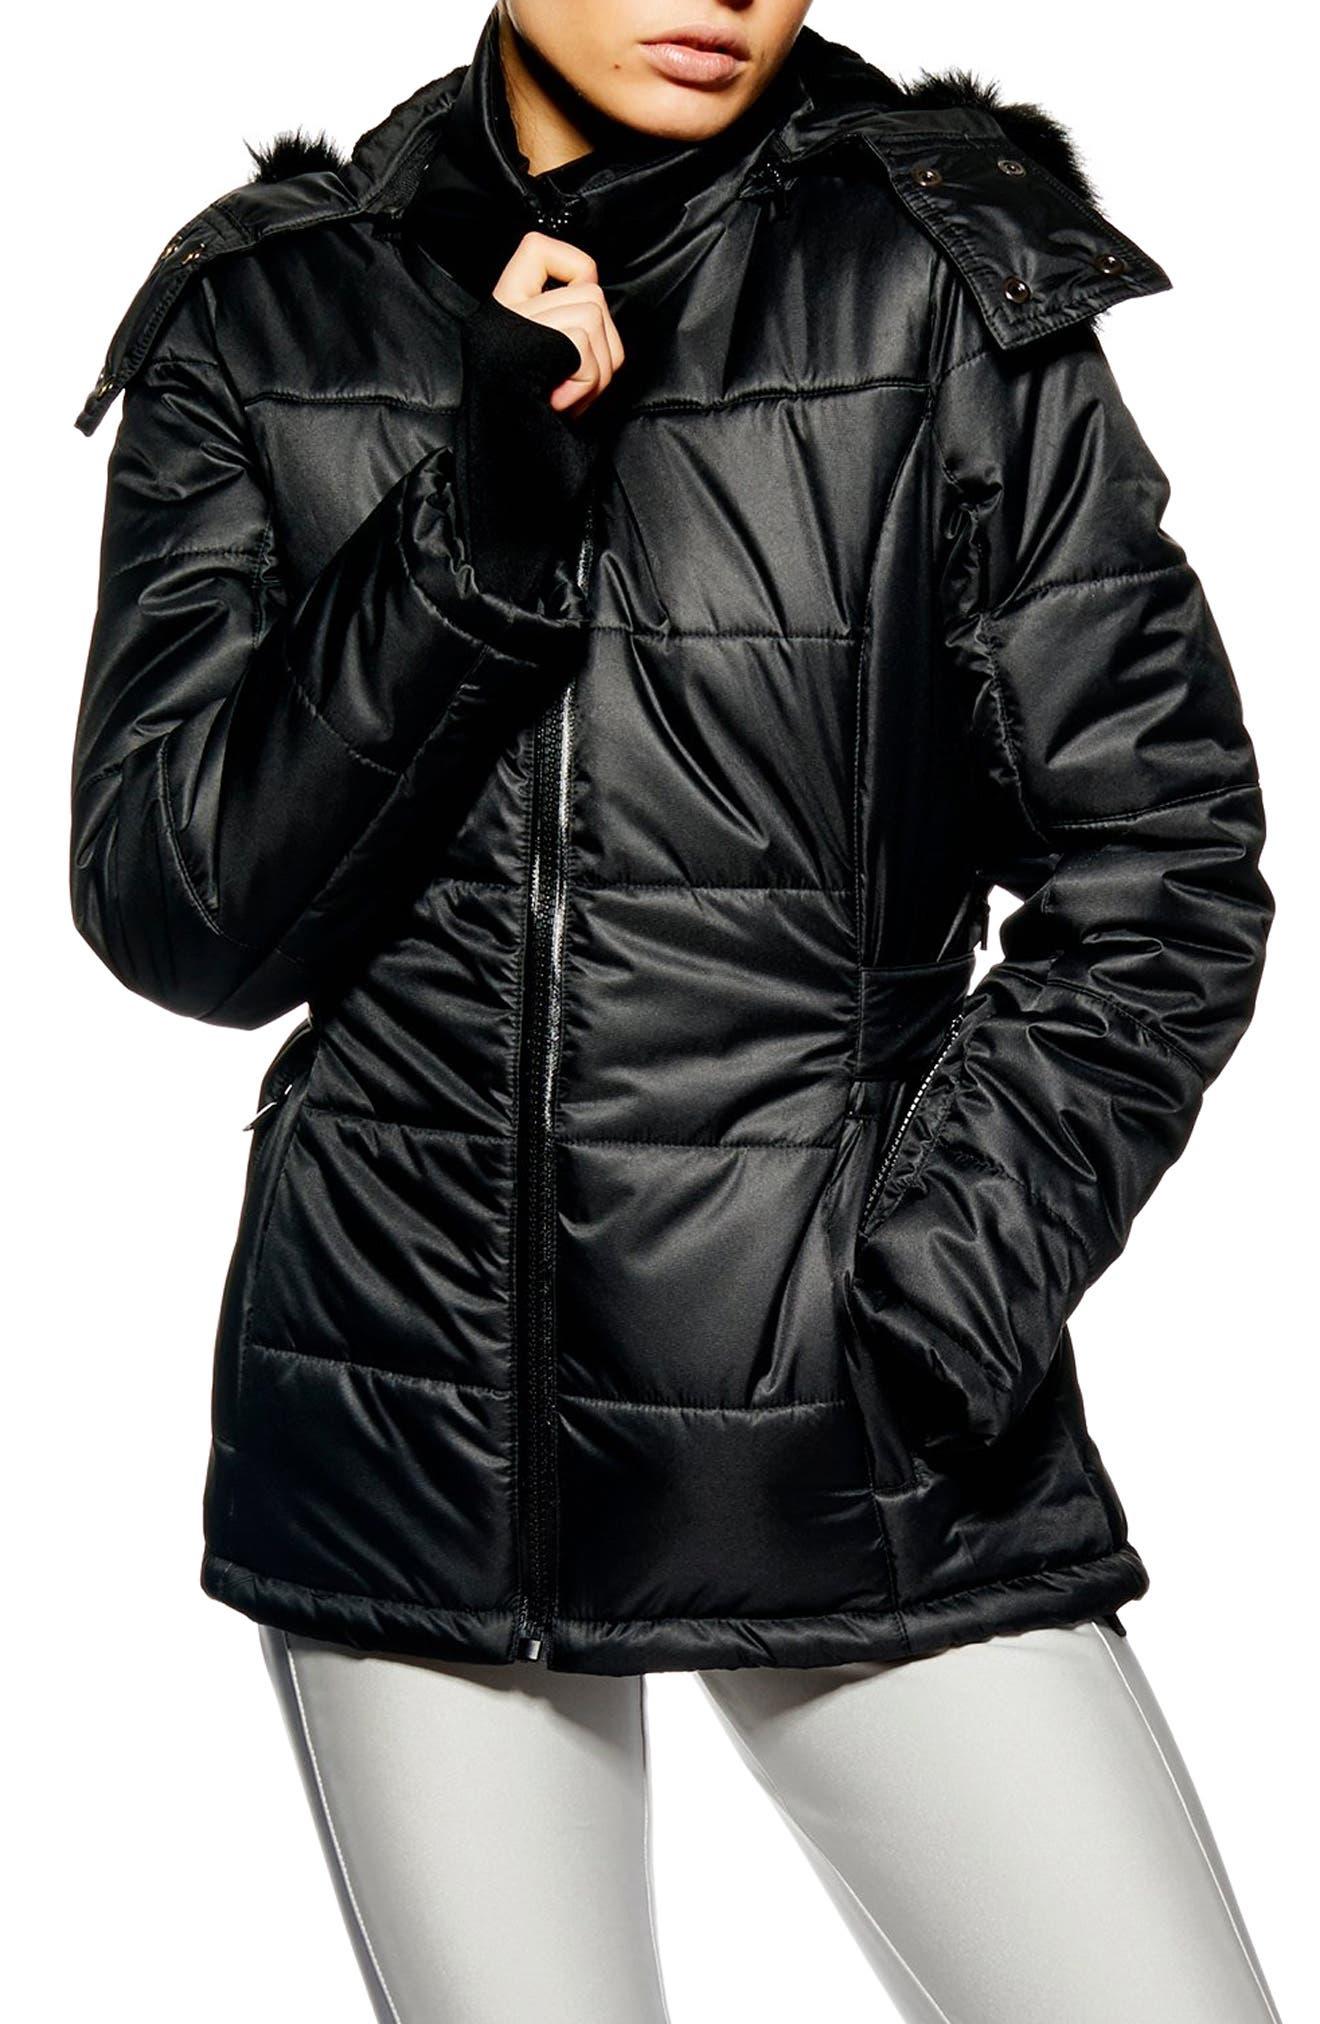 Sno Baby Ski Jacket,                         Main,                         color, BLACK